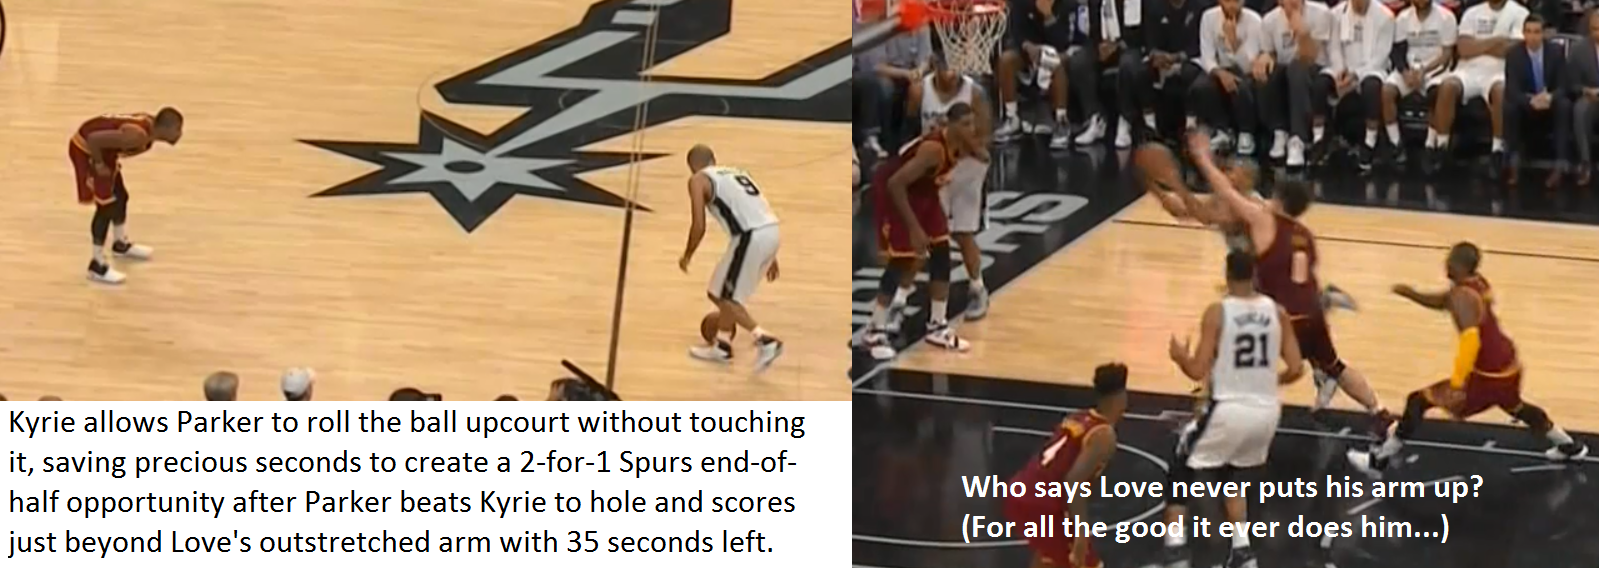 spurs_roll_ball_up_court.png